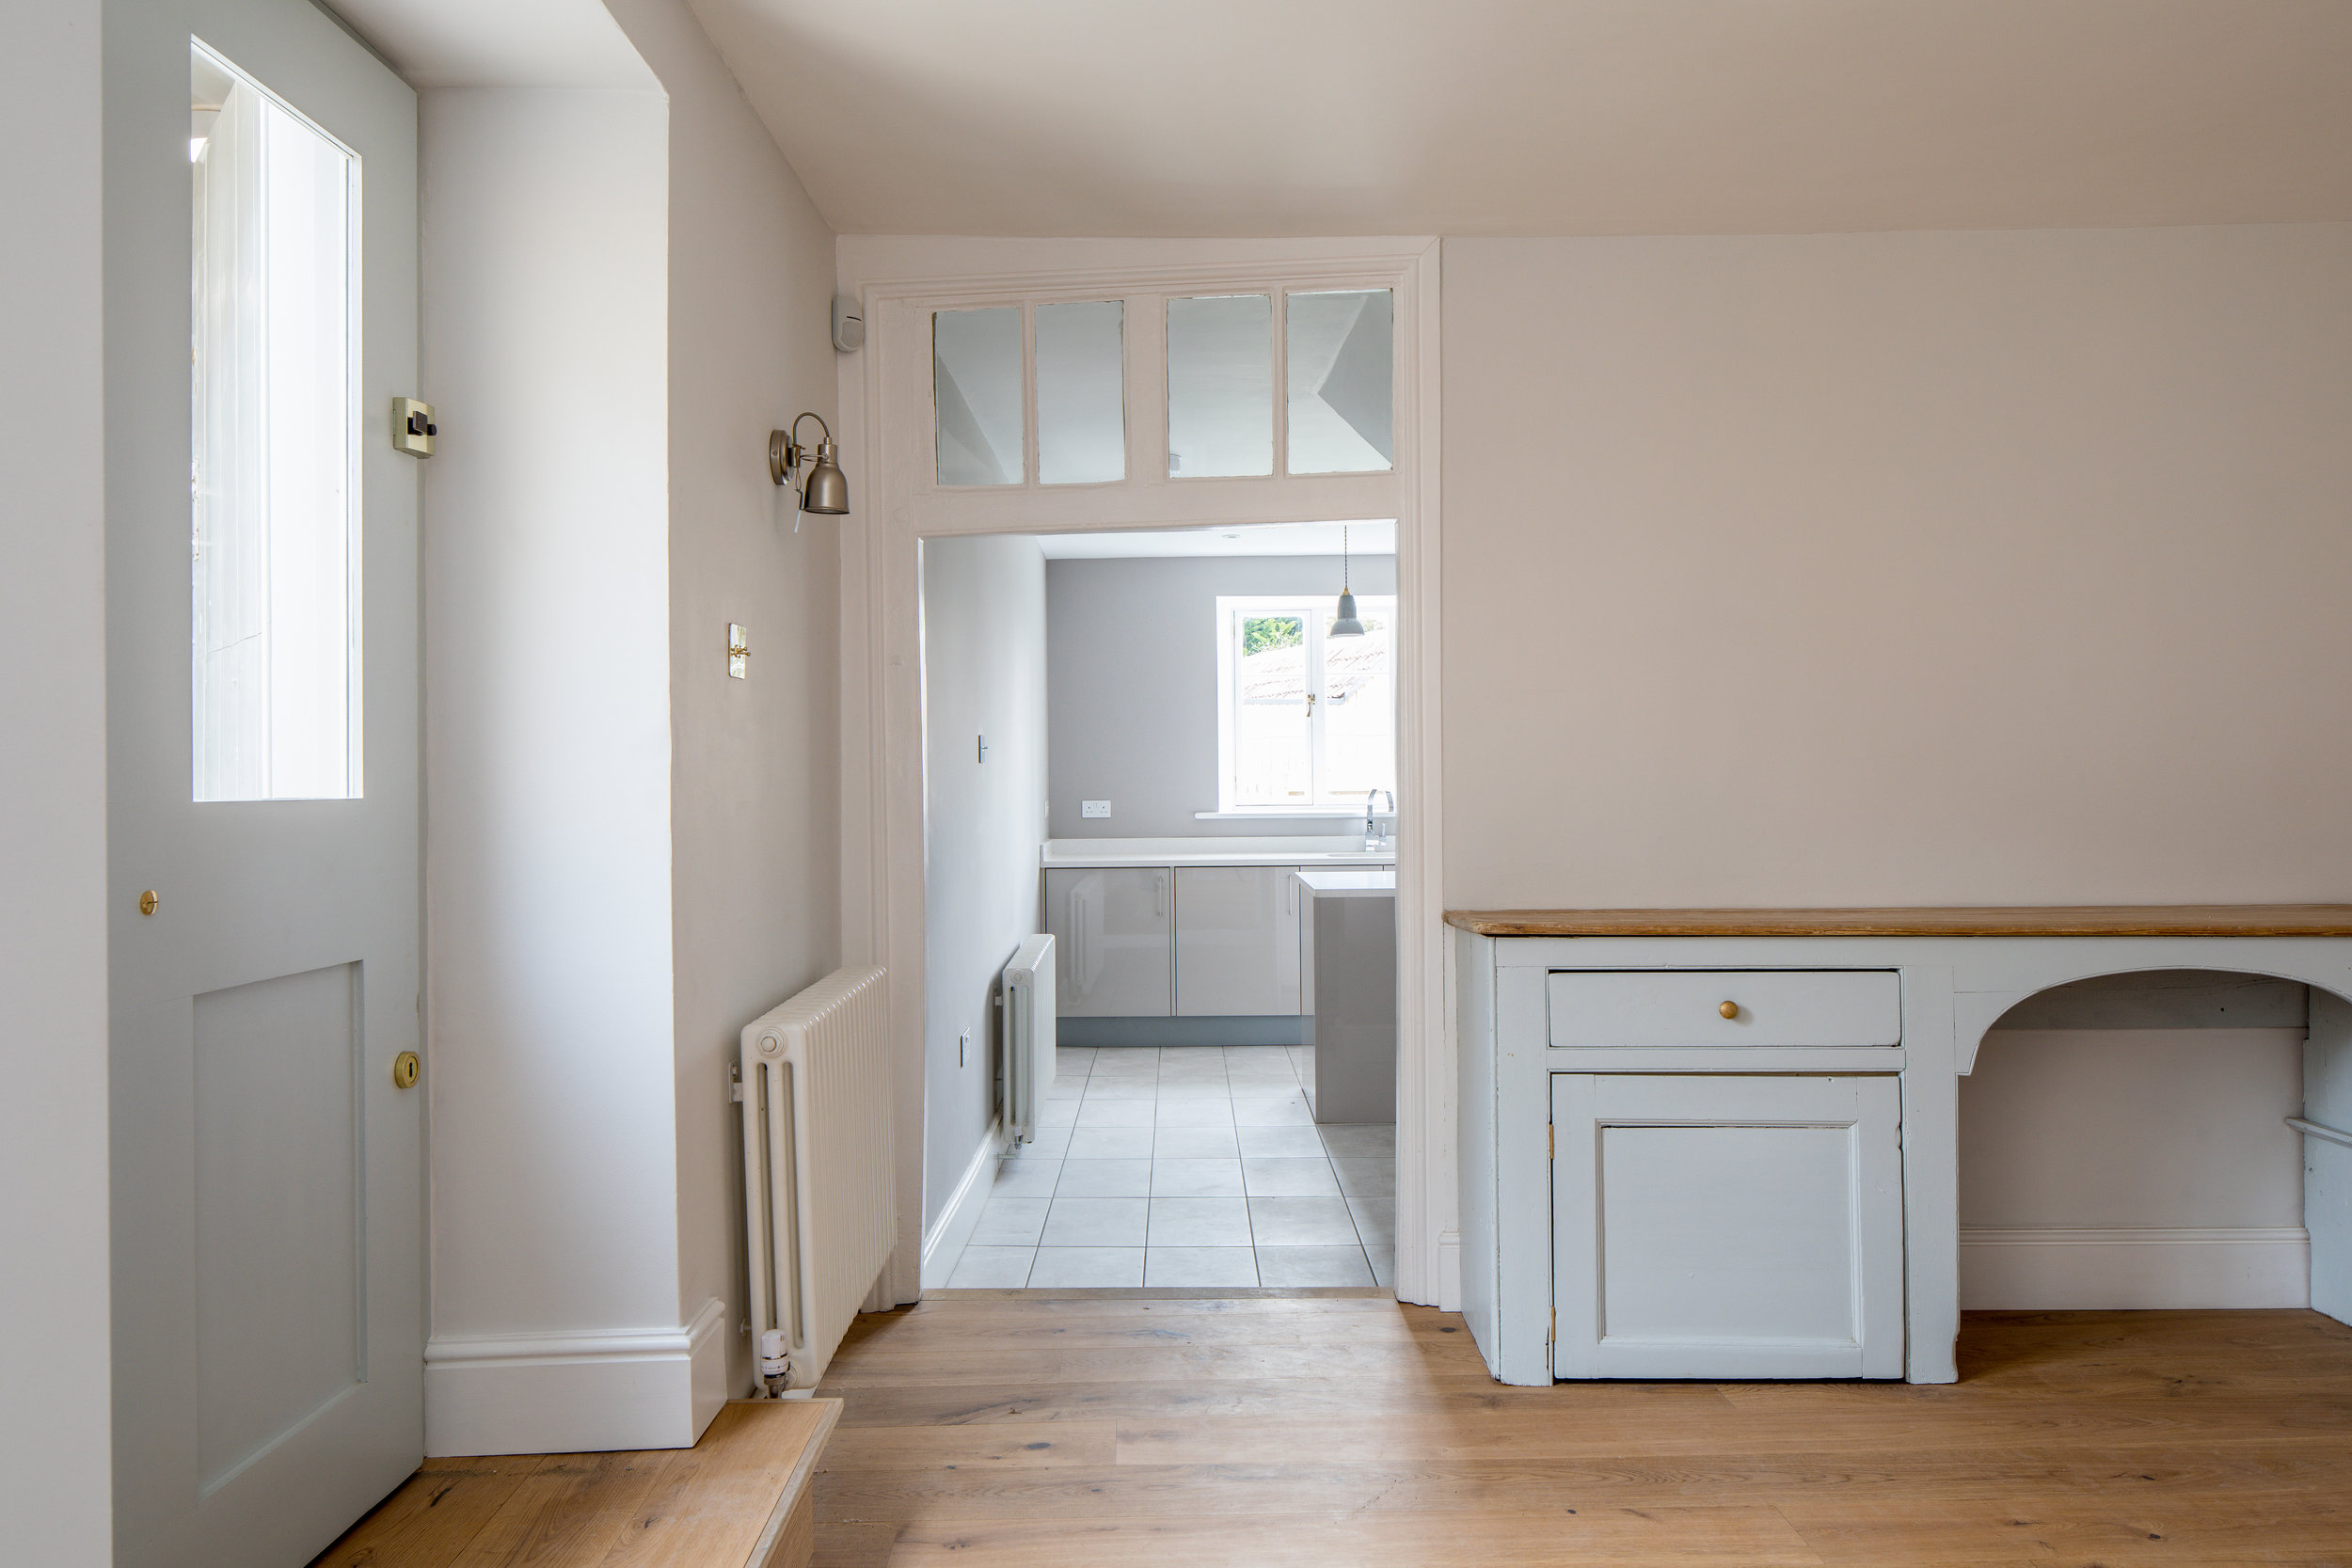 a1 view to kitchen.jpg